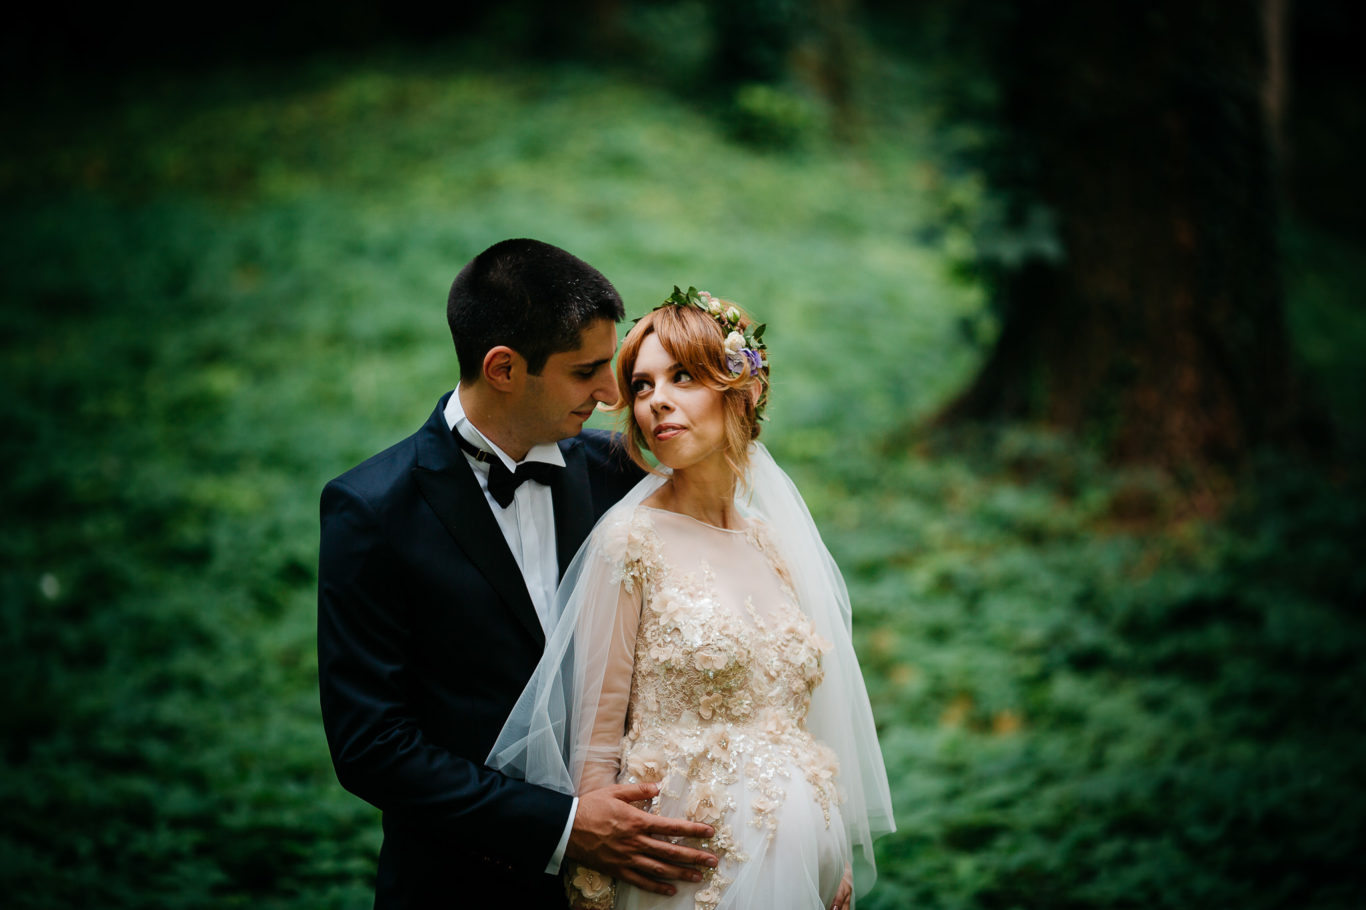 0185-Fotografie-nunta-Stirbey-Laura-Rares-fotograf-Ciprian-Dumitrescu-DCF_3383